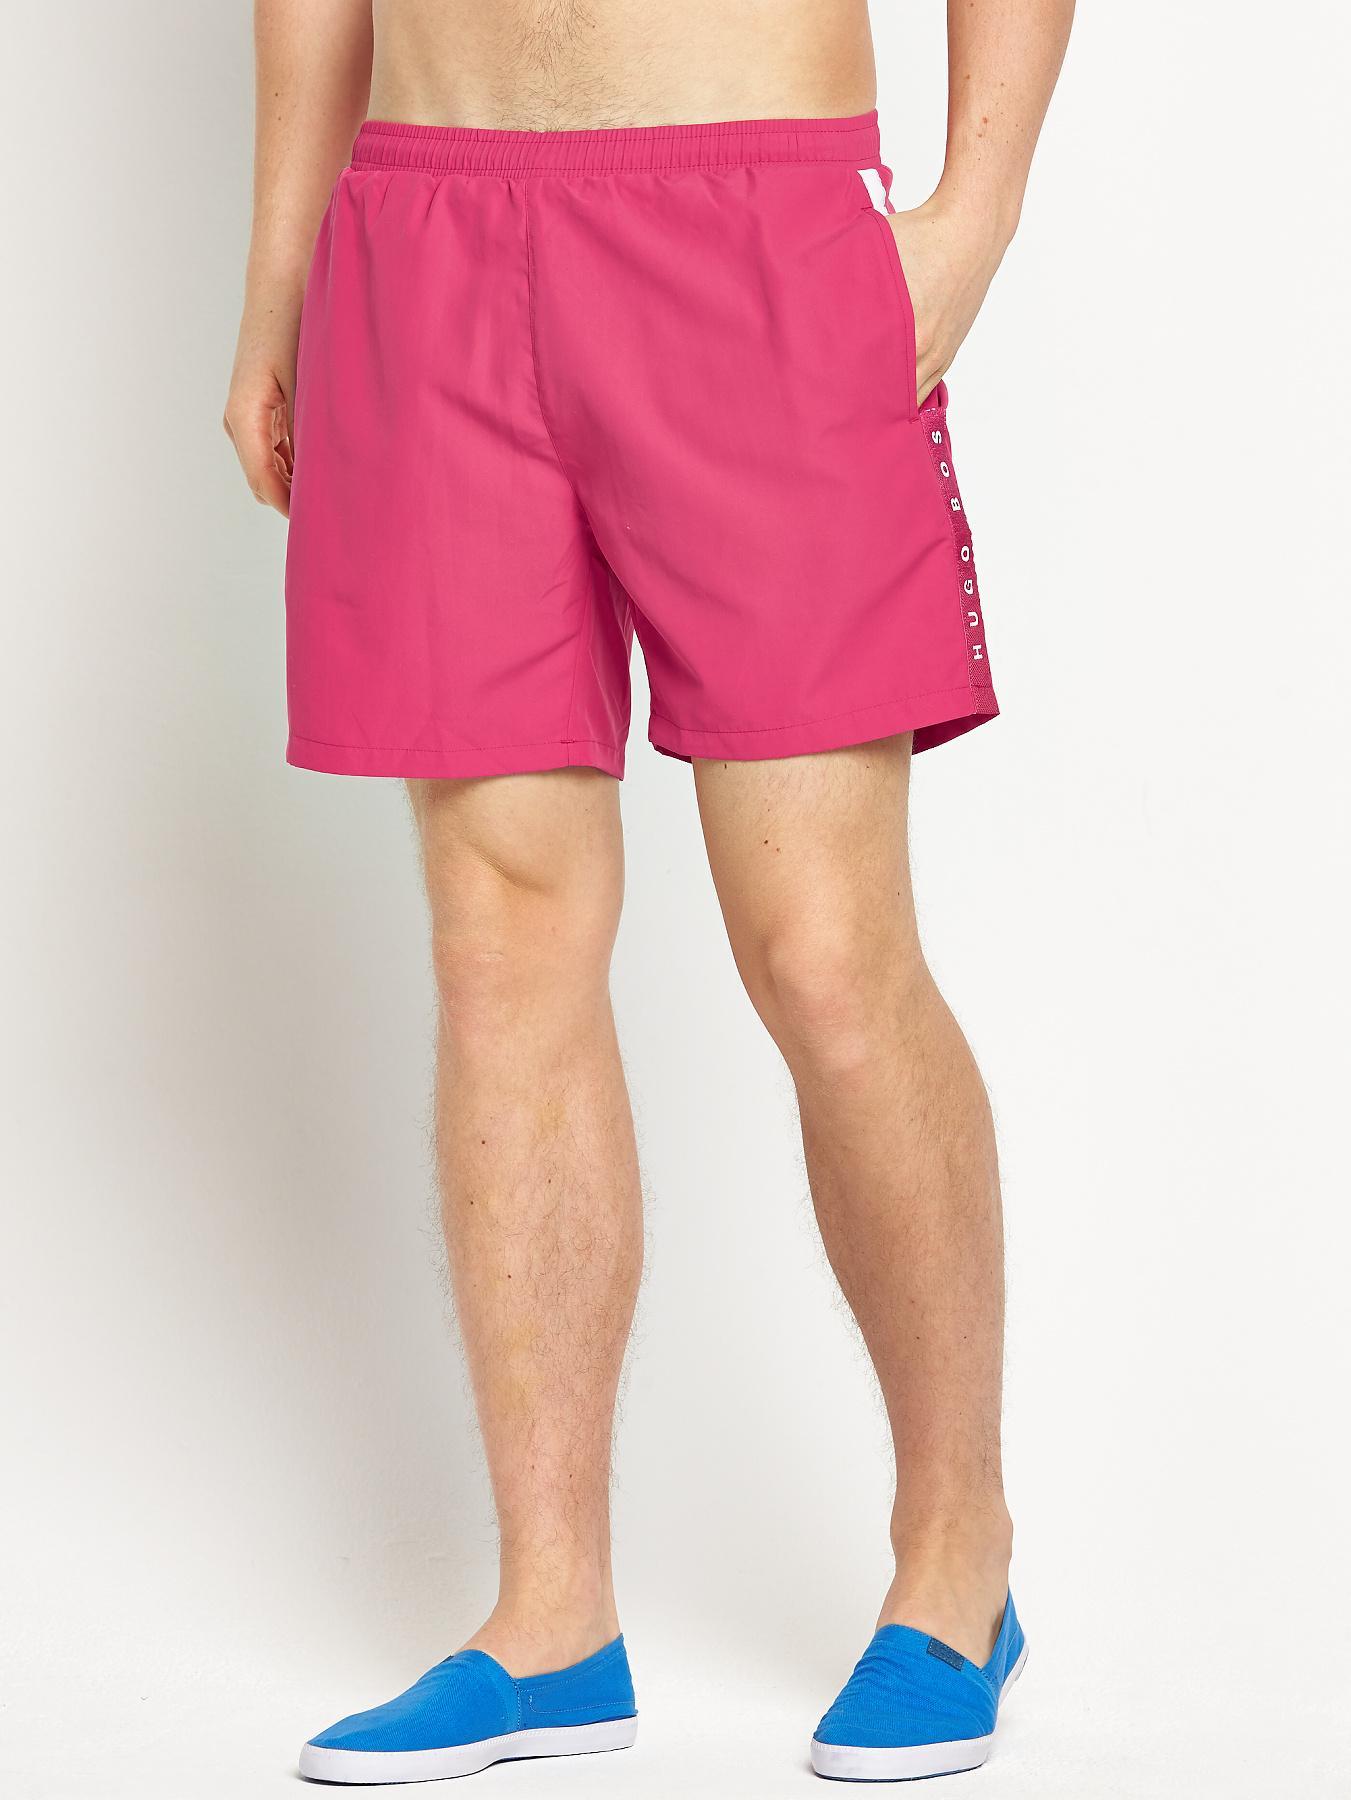 Hugo Boss Mens Seabream Swim Shorts - Red - Red, Red